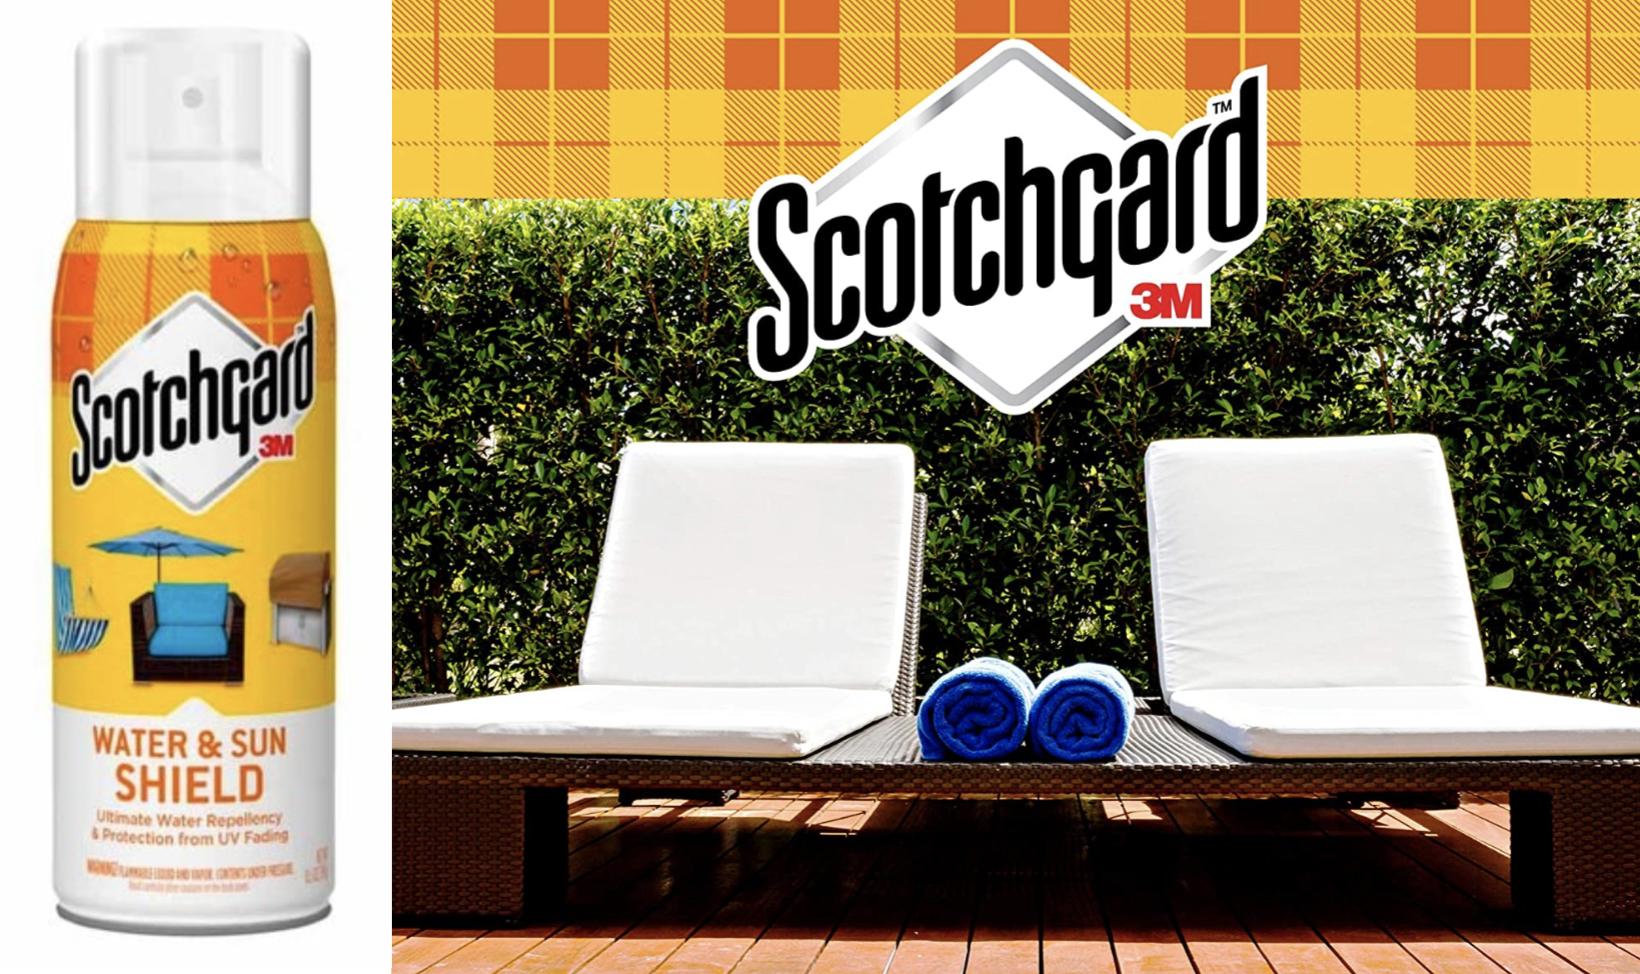 Scotchgard Winter & Sun Shield for Outdoor Fabrics